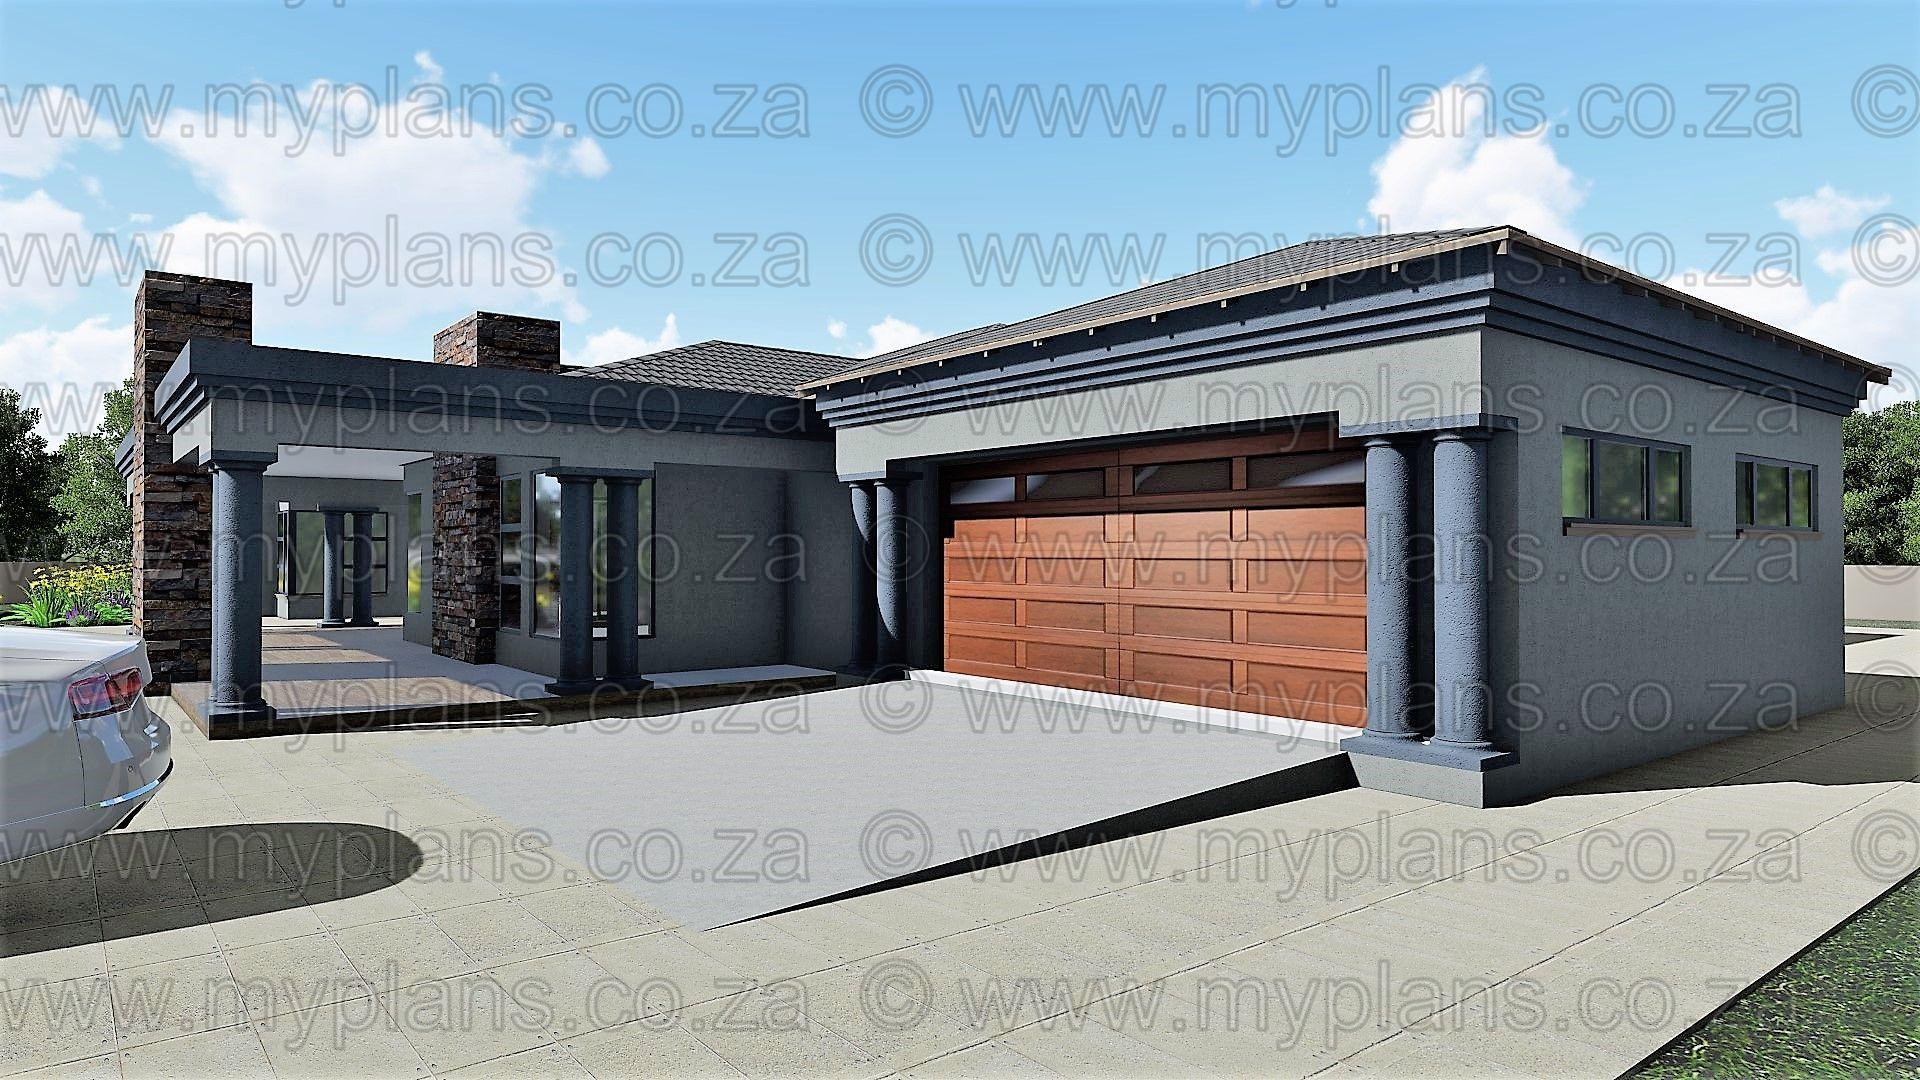 4 Bedroom House Plan Mlb 058 1s House Plan Gallery Bedroom